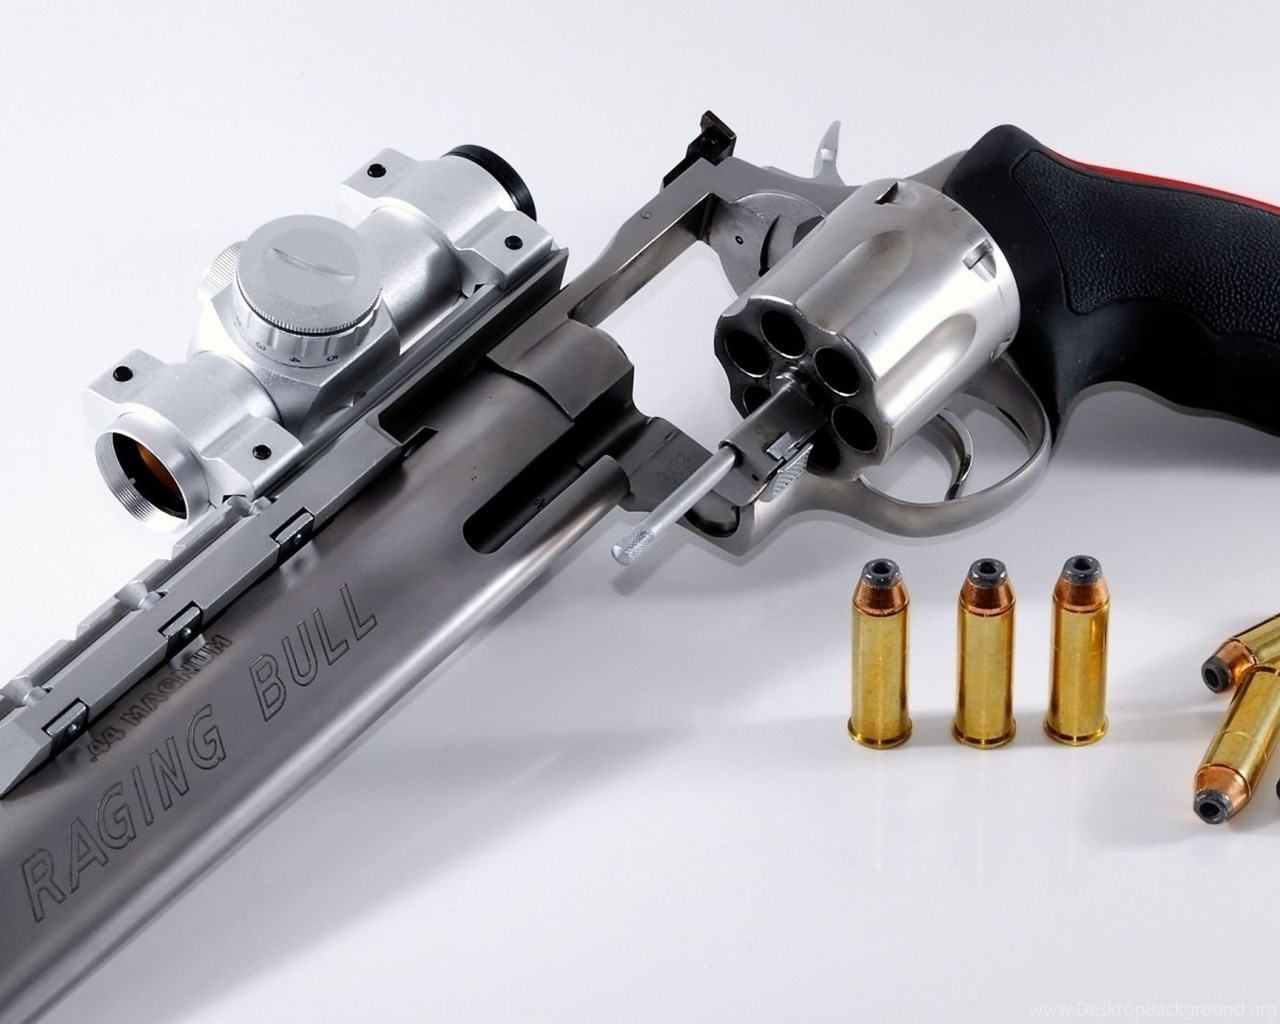 Download Wallpapers 1920x1080 Gun, Bullets, Metal, Weapons